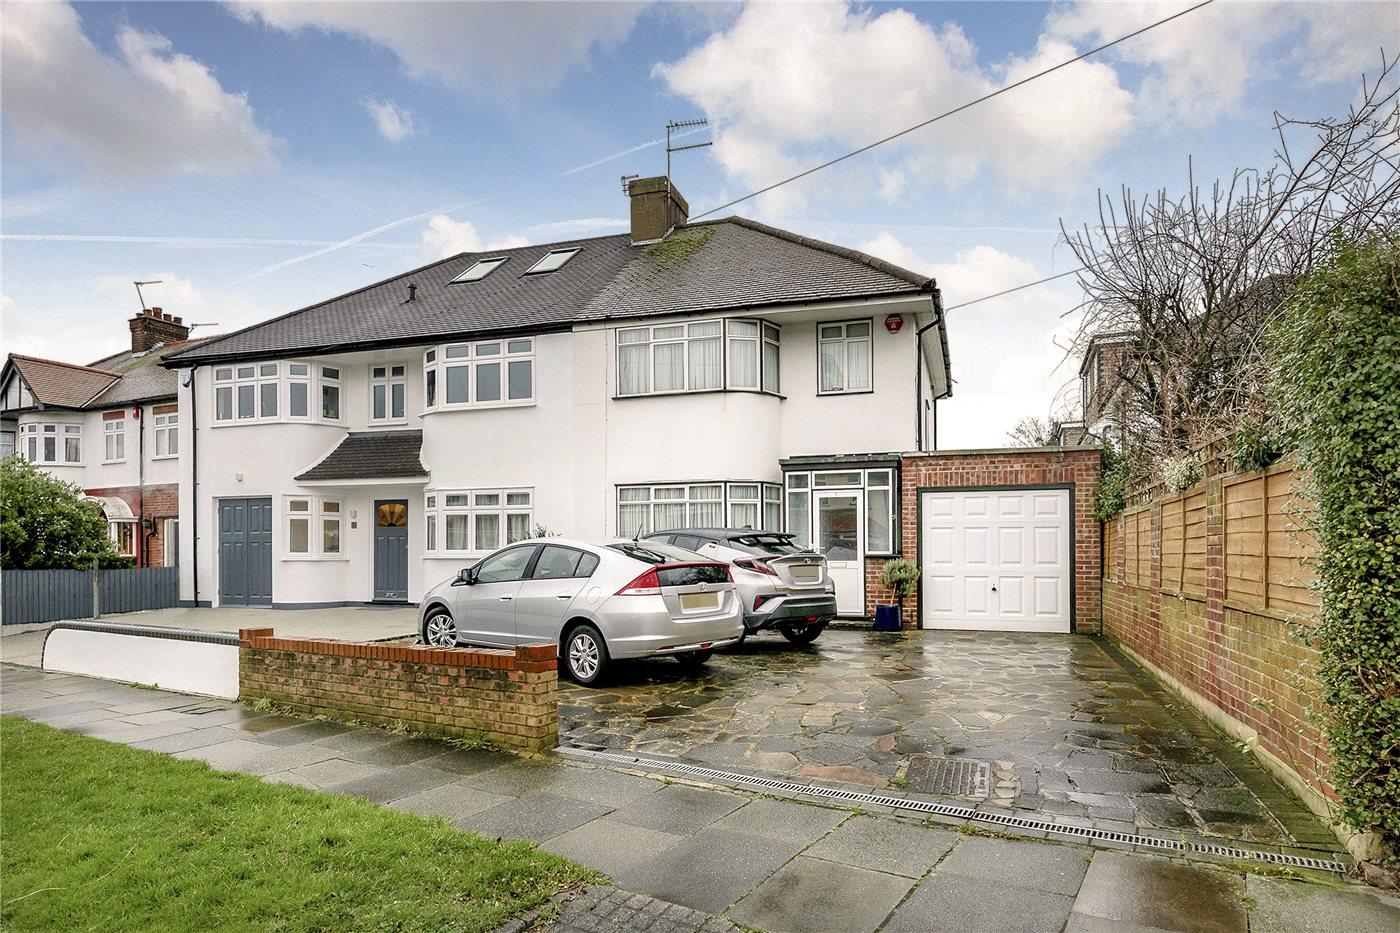 3 Bedrooms Semi Detached House for sale in Churchbury Lane, Enfield, EN1